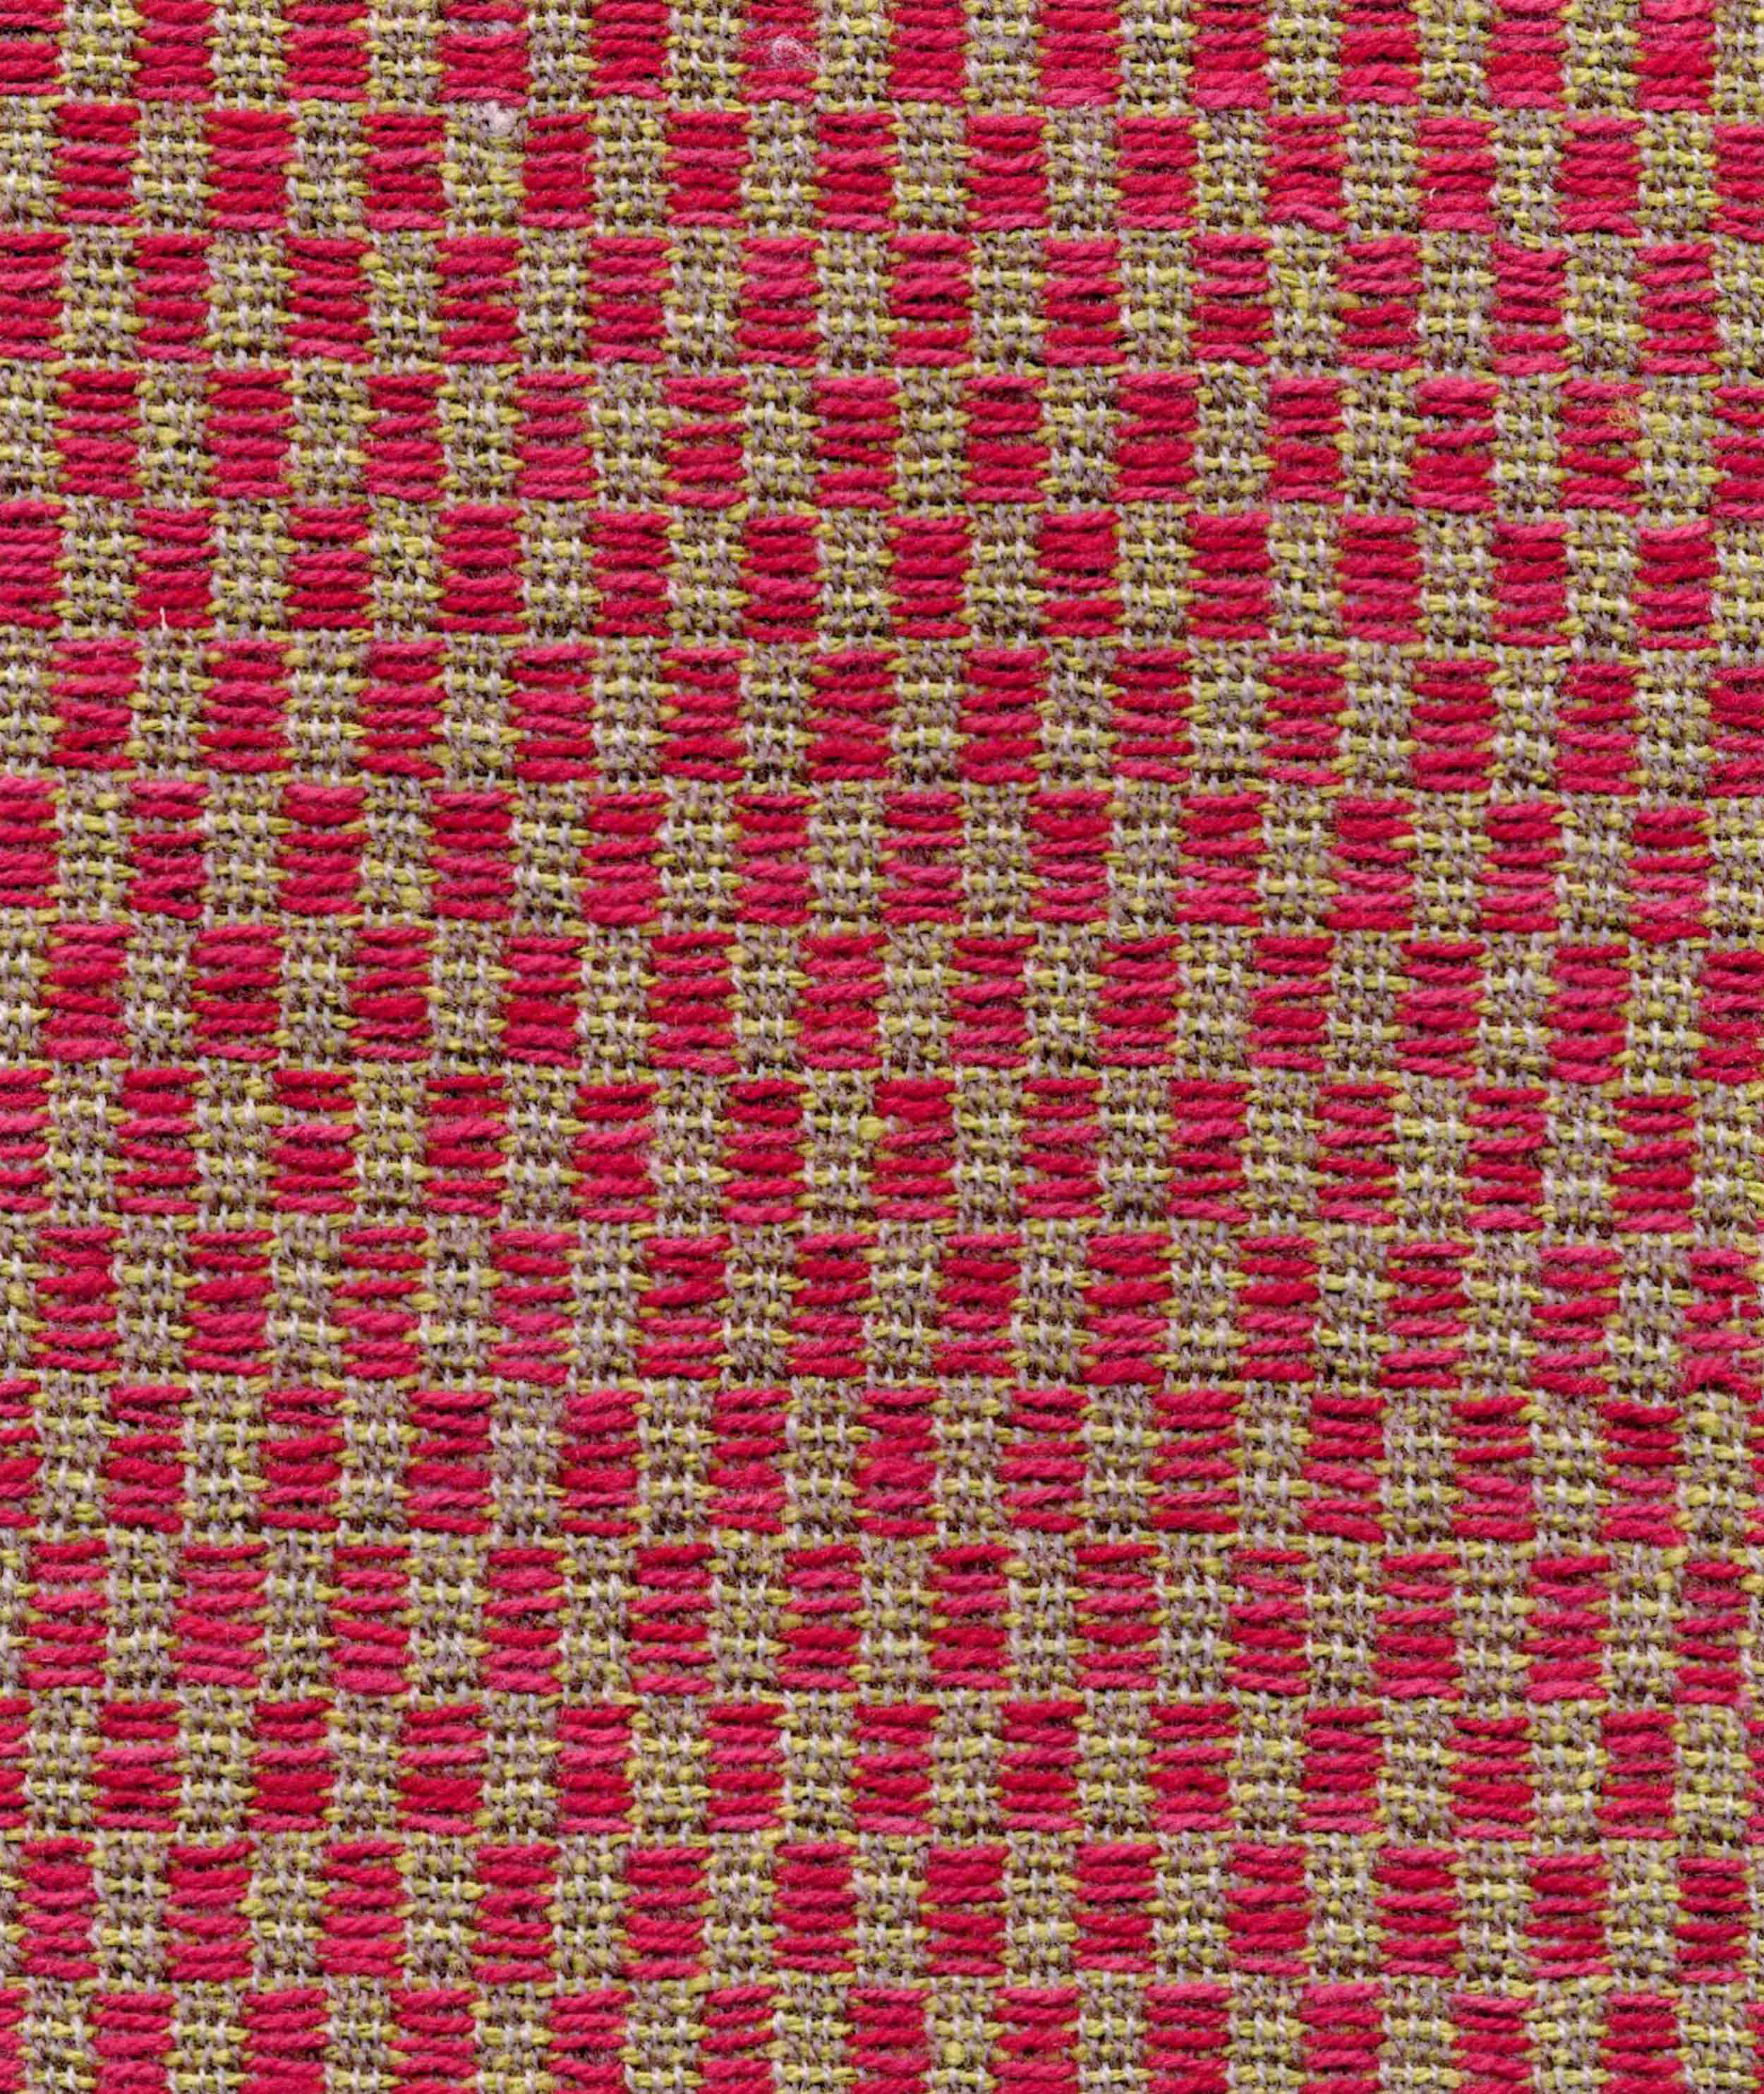 weave6-pink-olive checkerboard.jpg